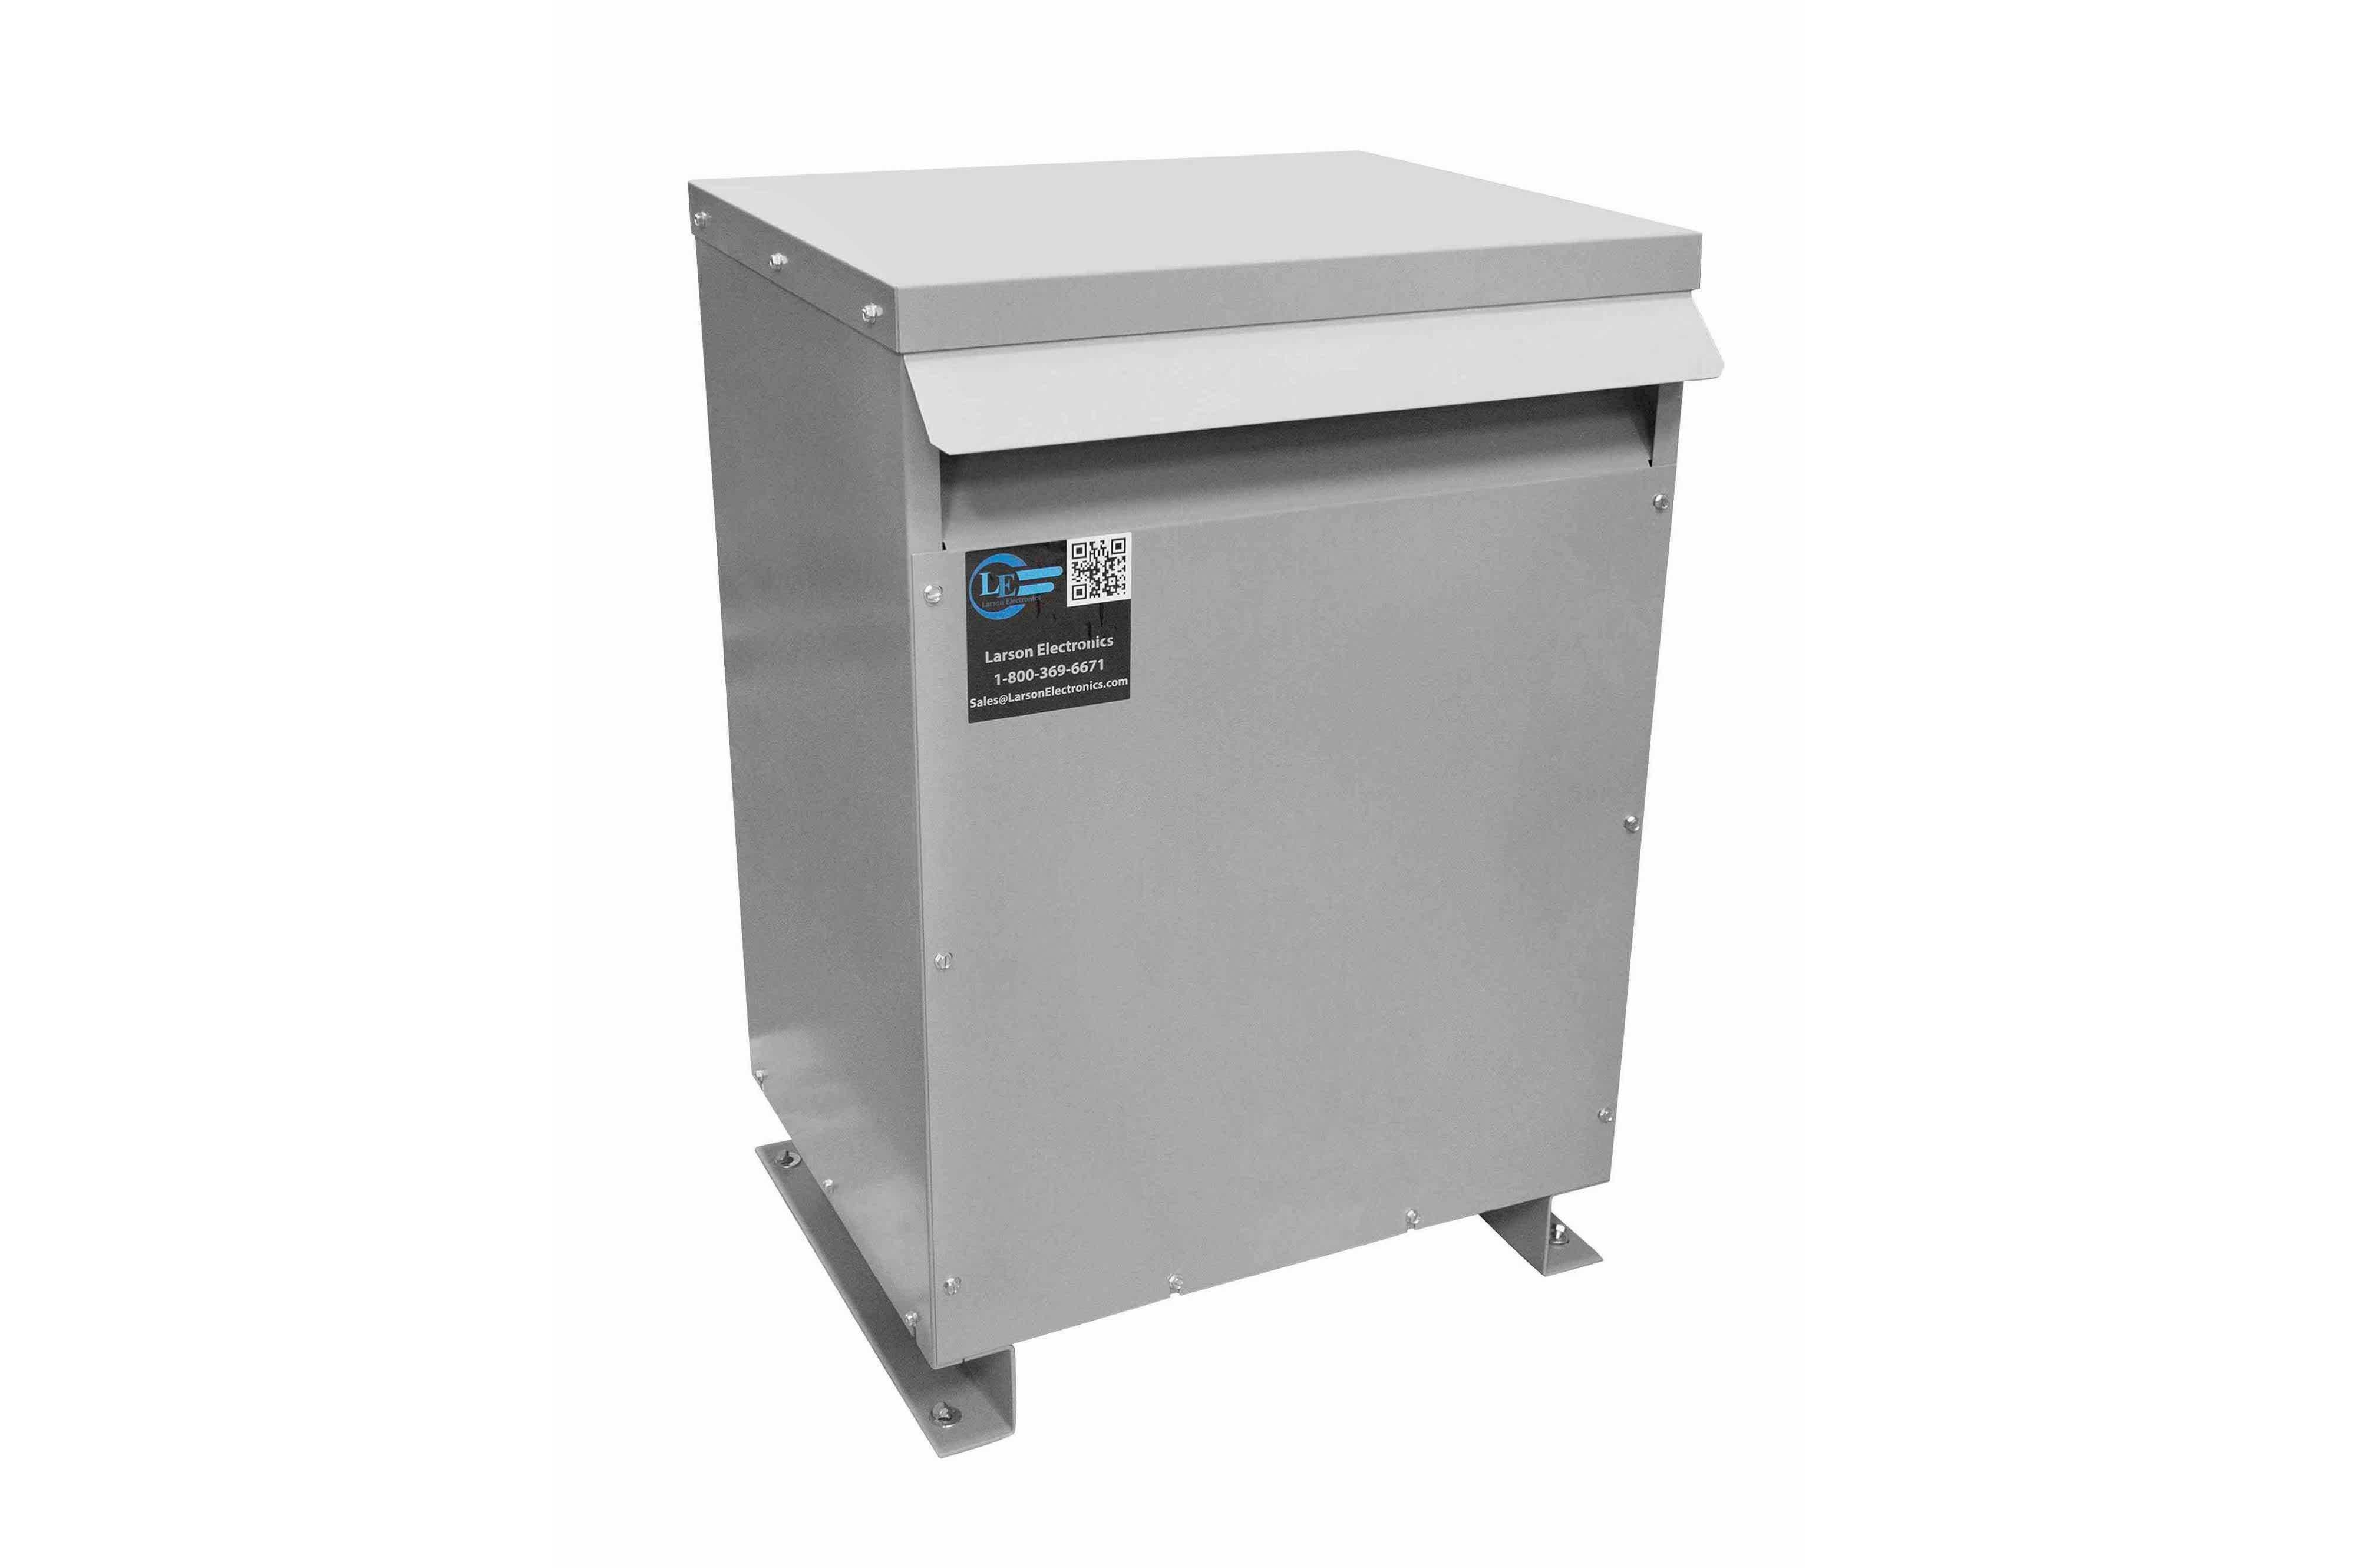 30 kVA 3PH Isolation Transformer, 240V Wye Primary, 400Y/231 Wye-N Secondary, N3R, Ventilated, 60 Hz